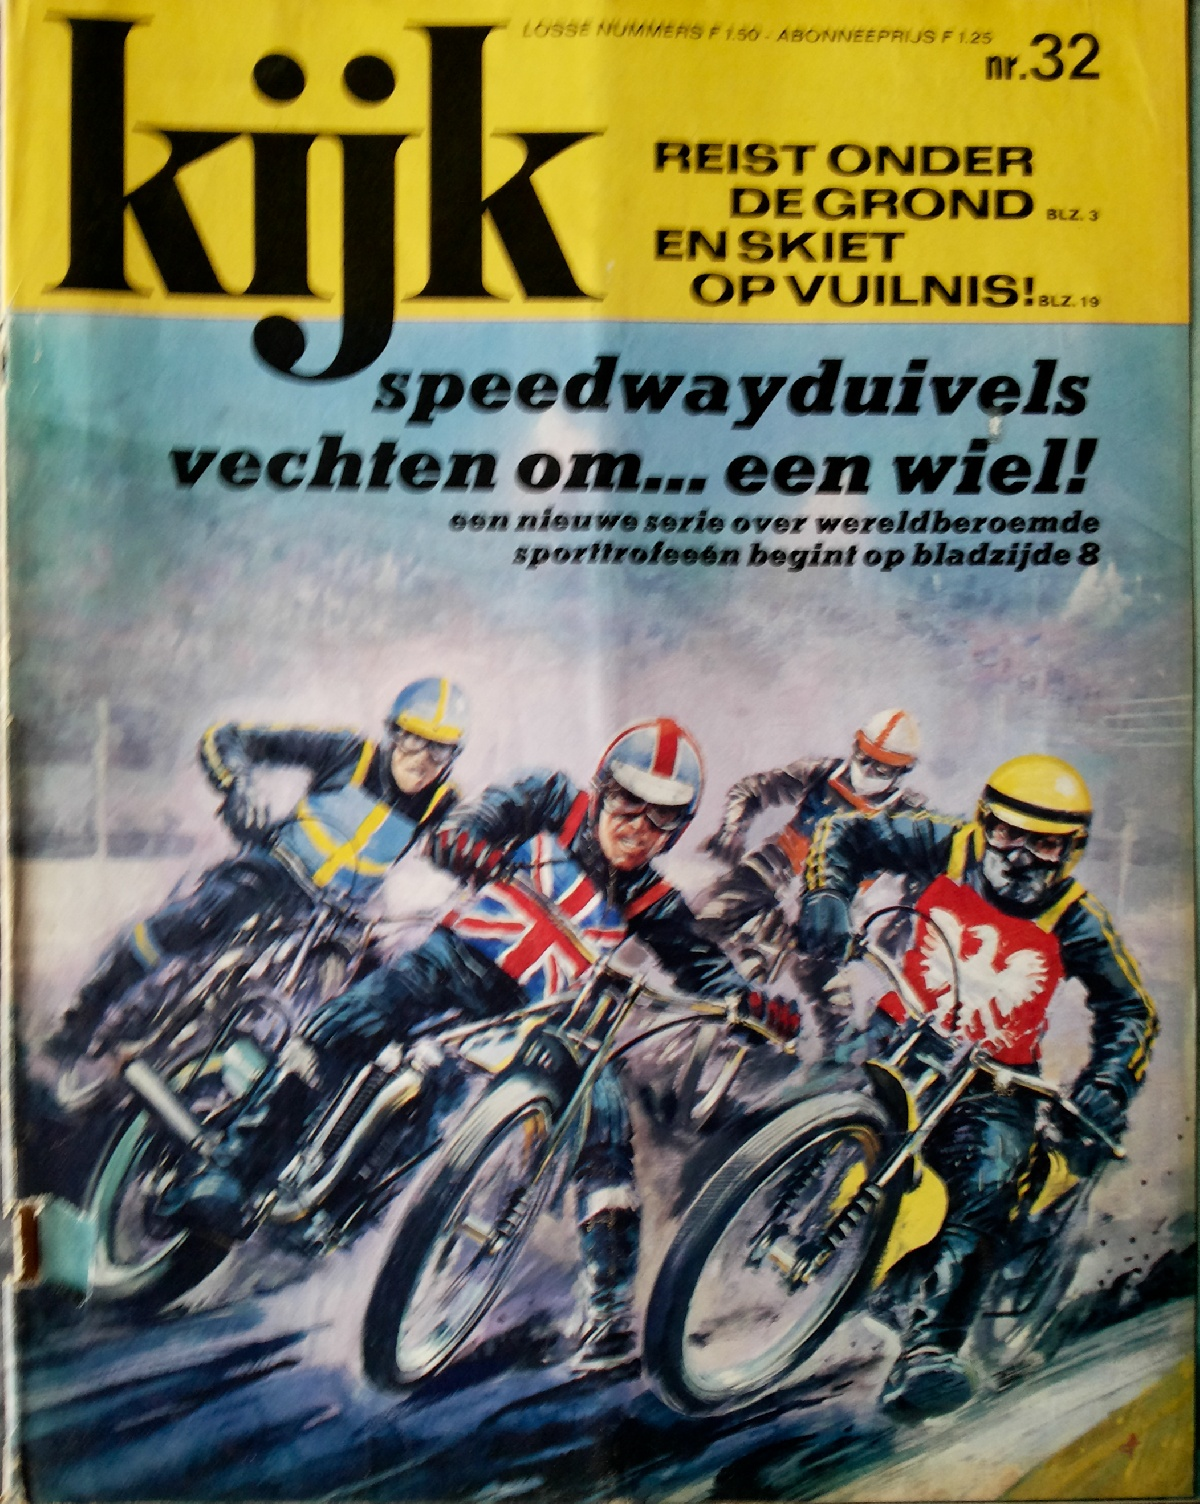 Kijk (17-07-1971)